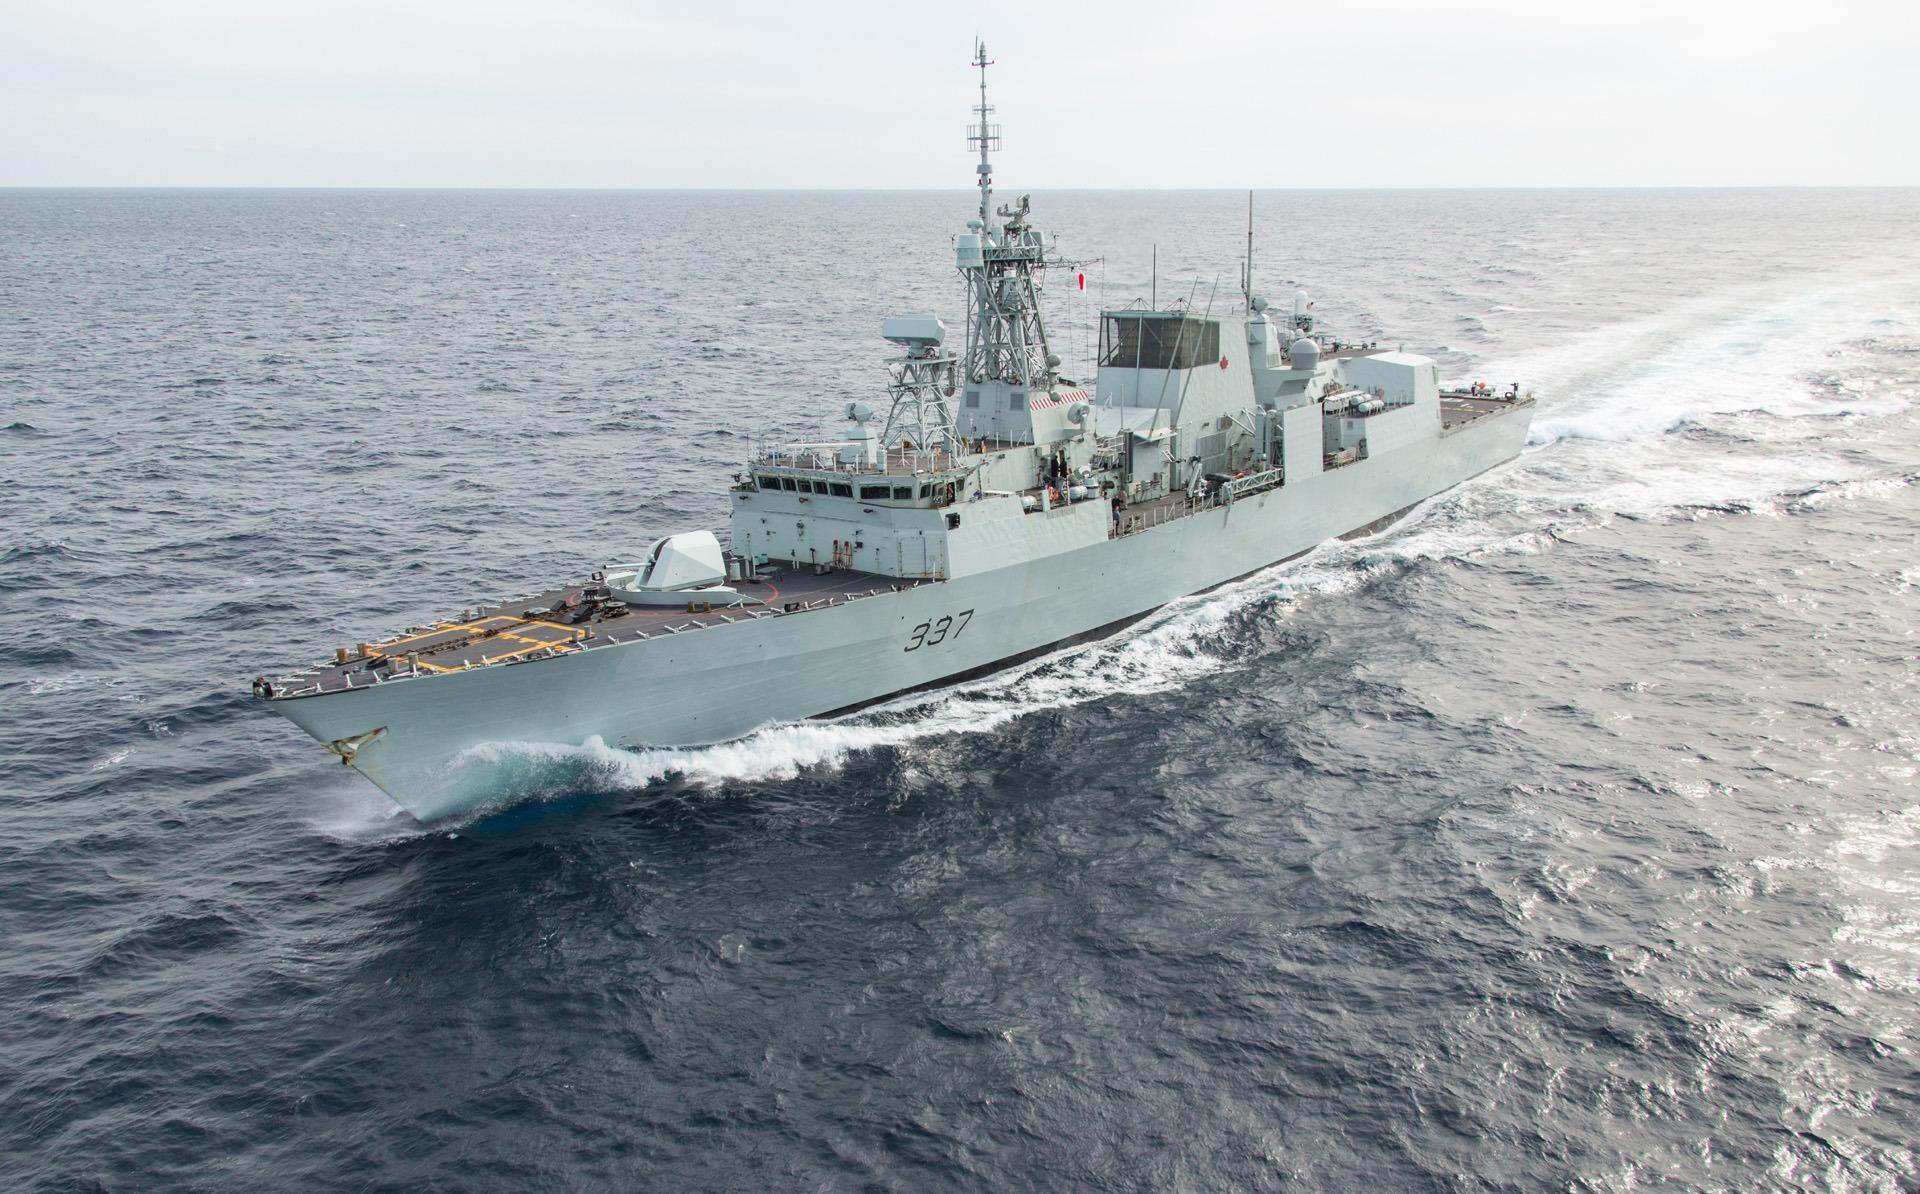 Halifax-class multi-role patrol frigate HMCS Fredericton